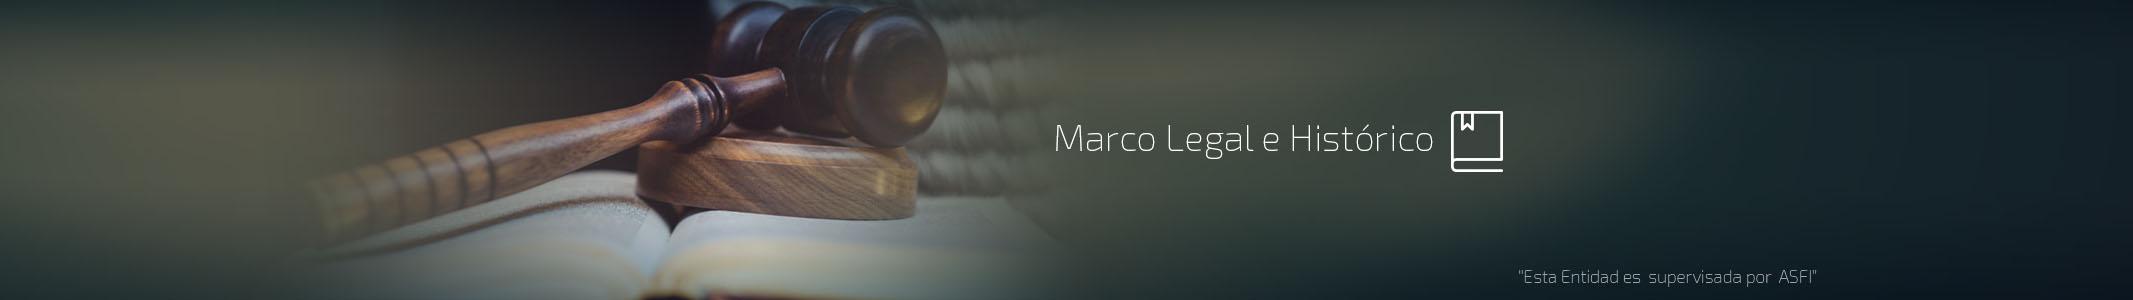 BDP Marco Legal2